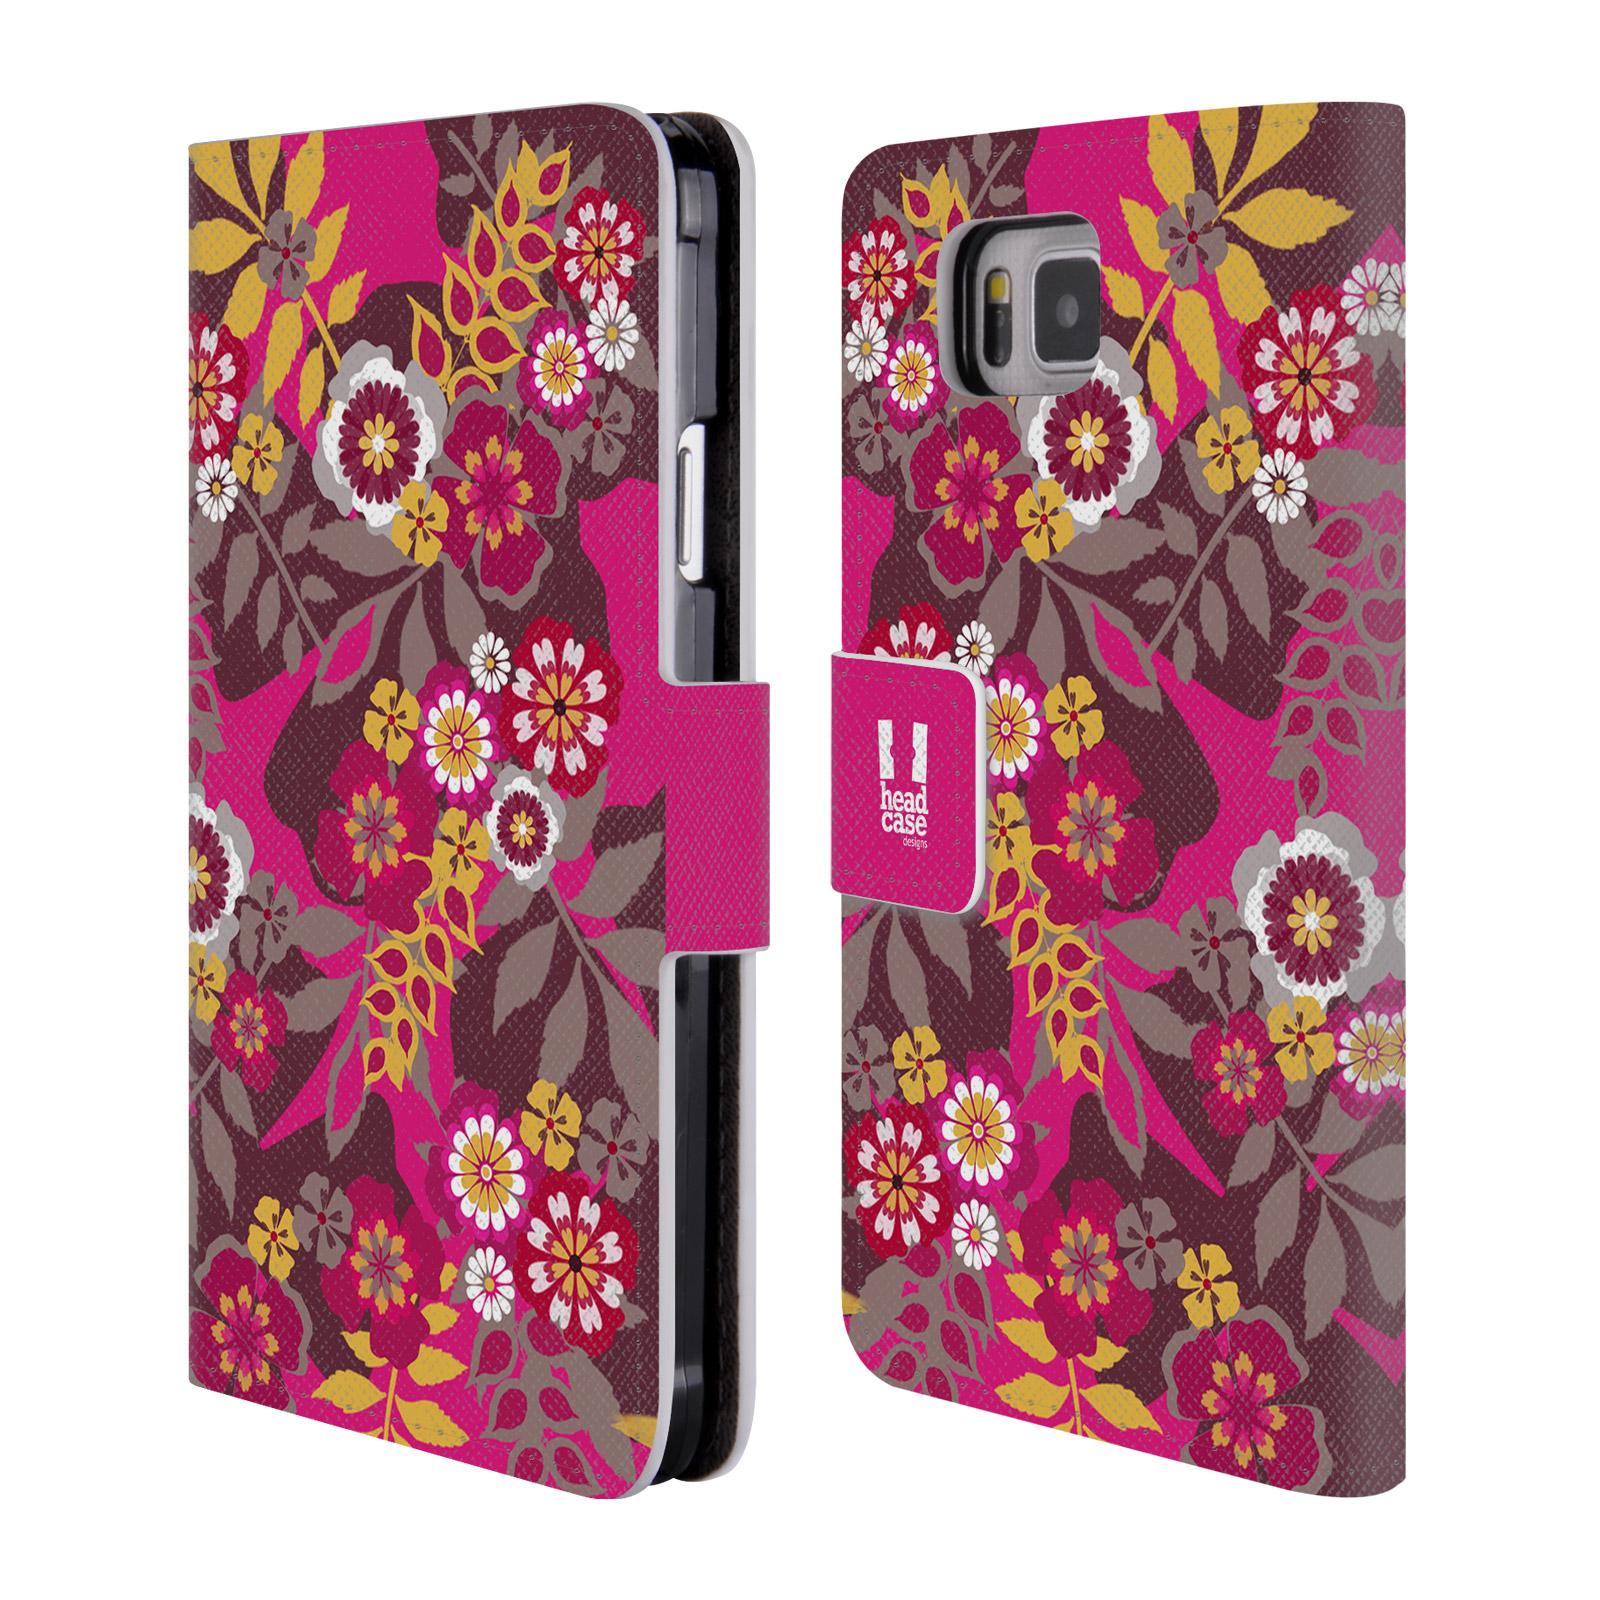 HEAD CASE Flipové pouzdro pro mobil Samsung Galaxy ALPHA BOTANIKA růžová a hnědá